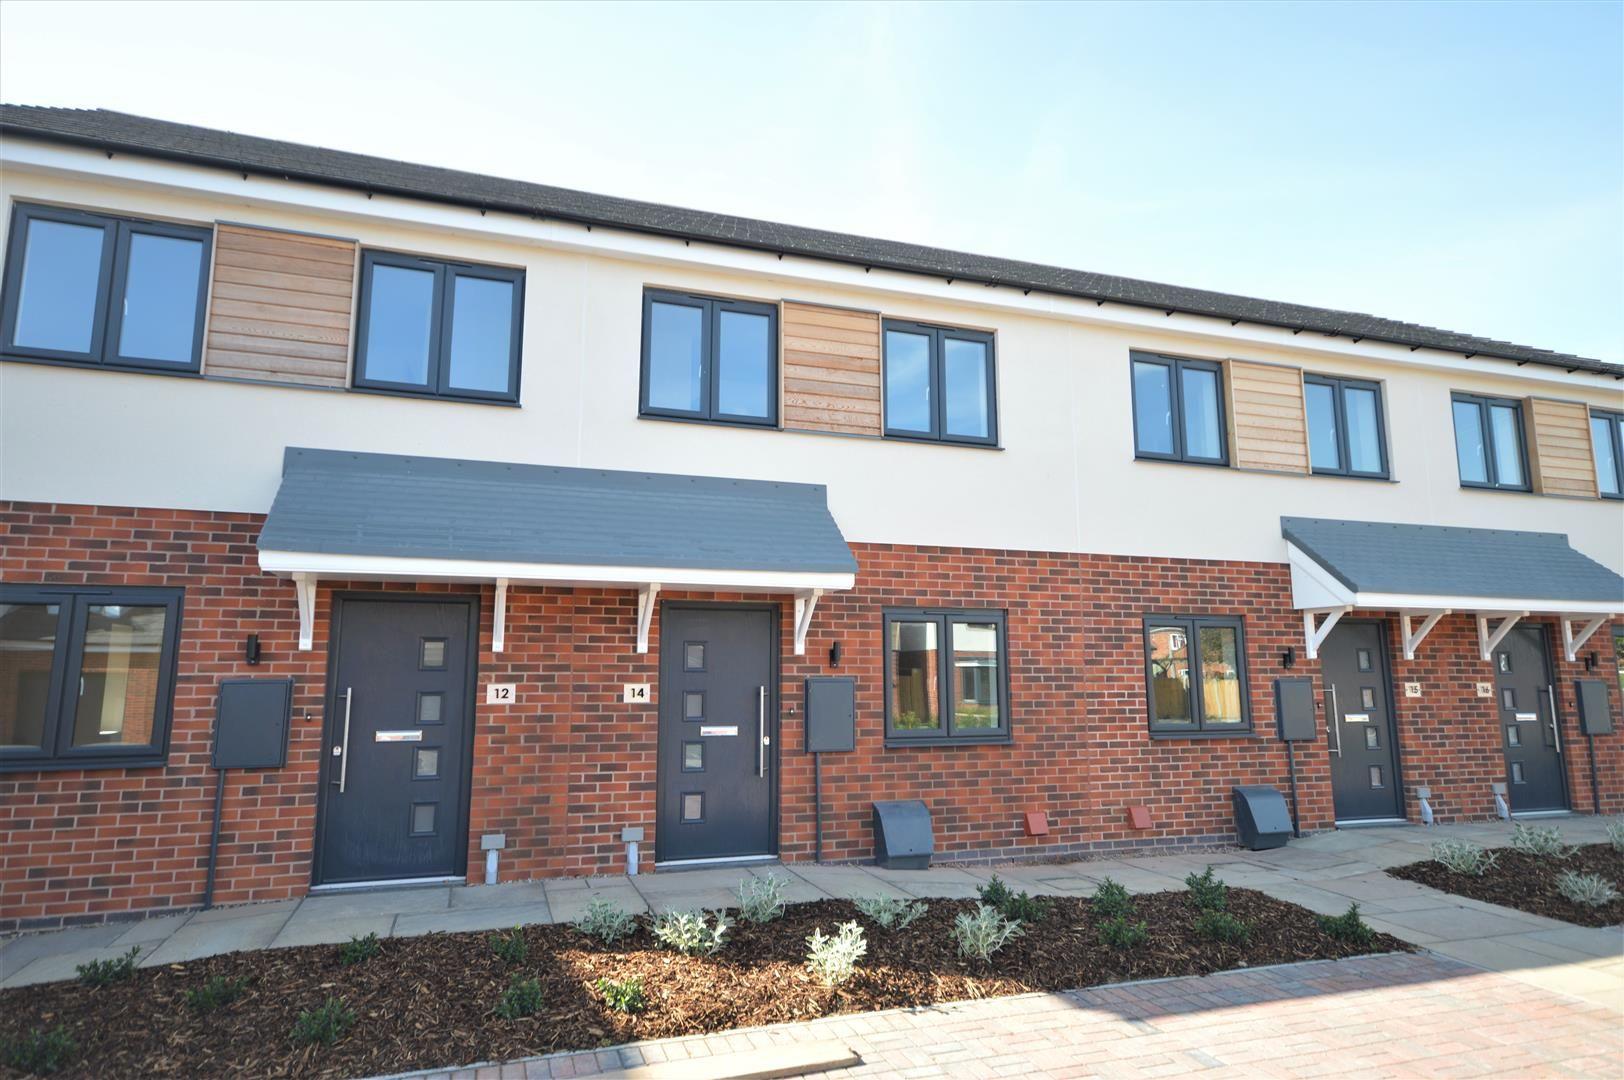 2 bed terraced for sale in Kingsland  - Property Image 1